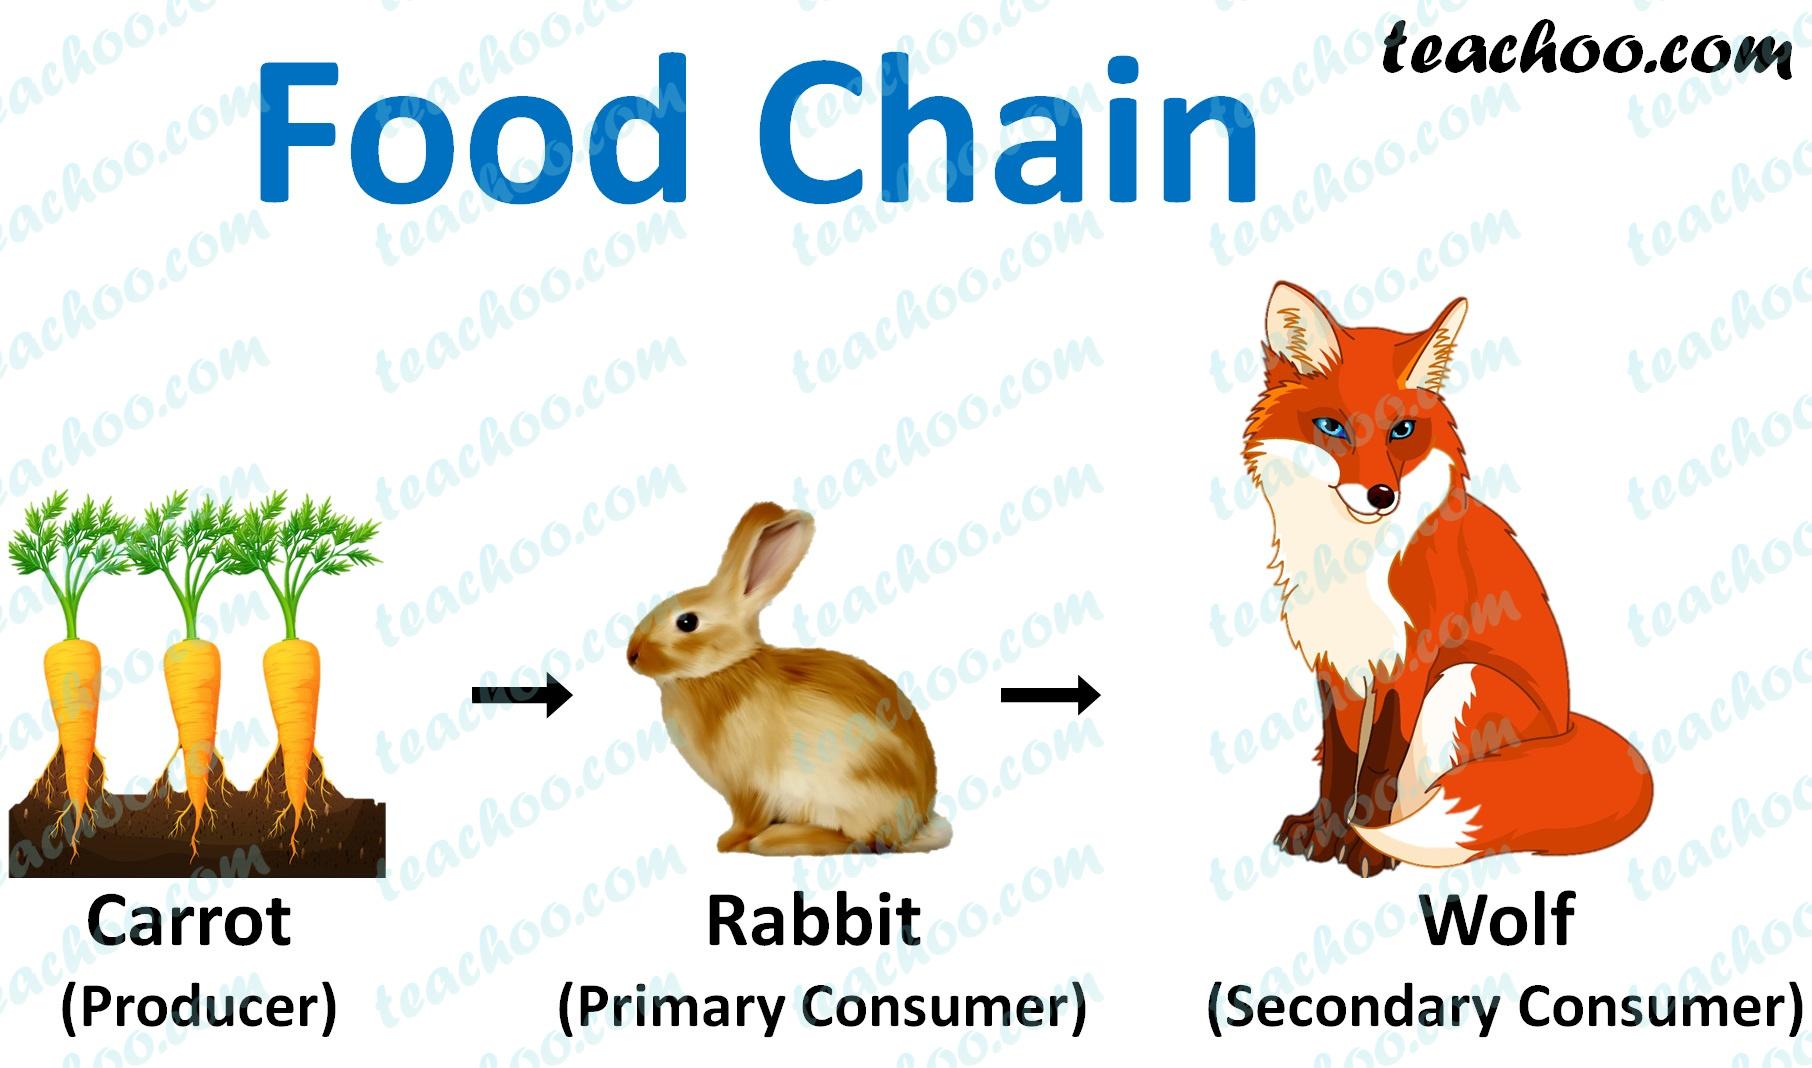 food-chain-ncert-q4---teachoo.jpg